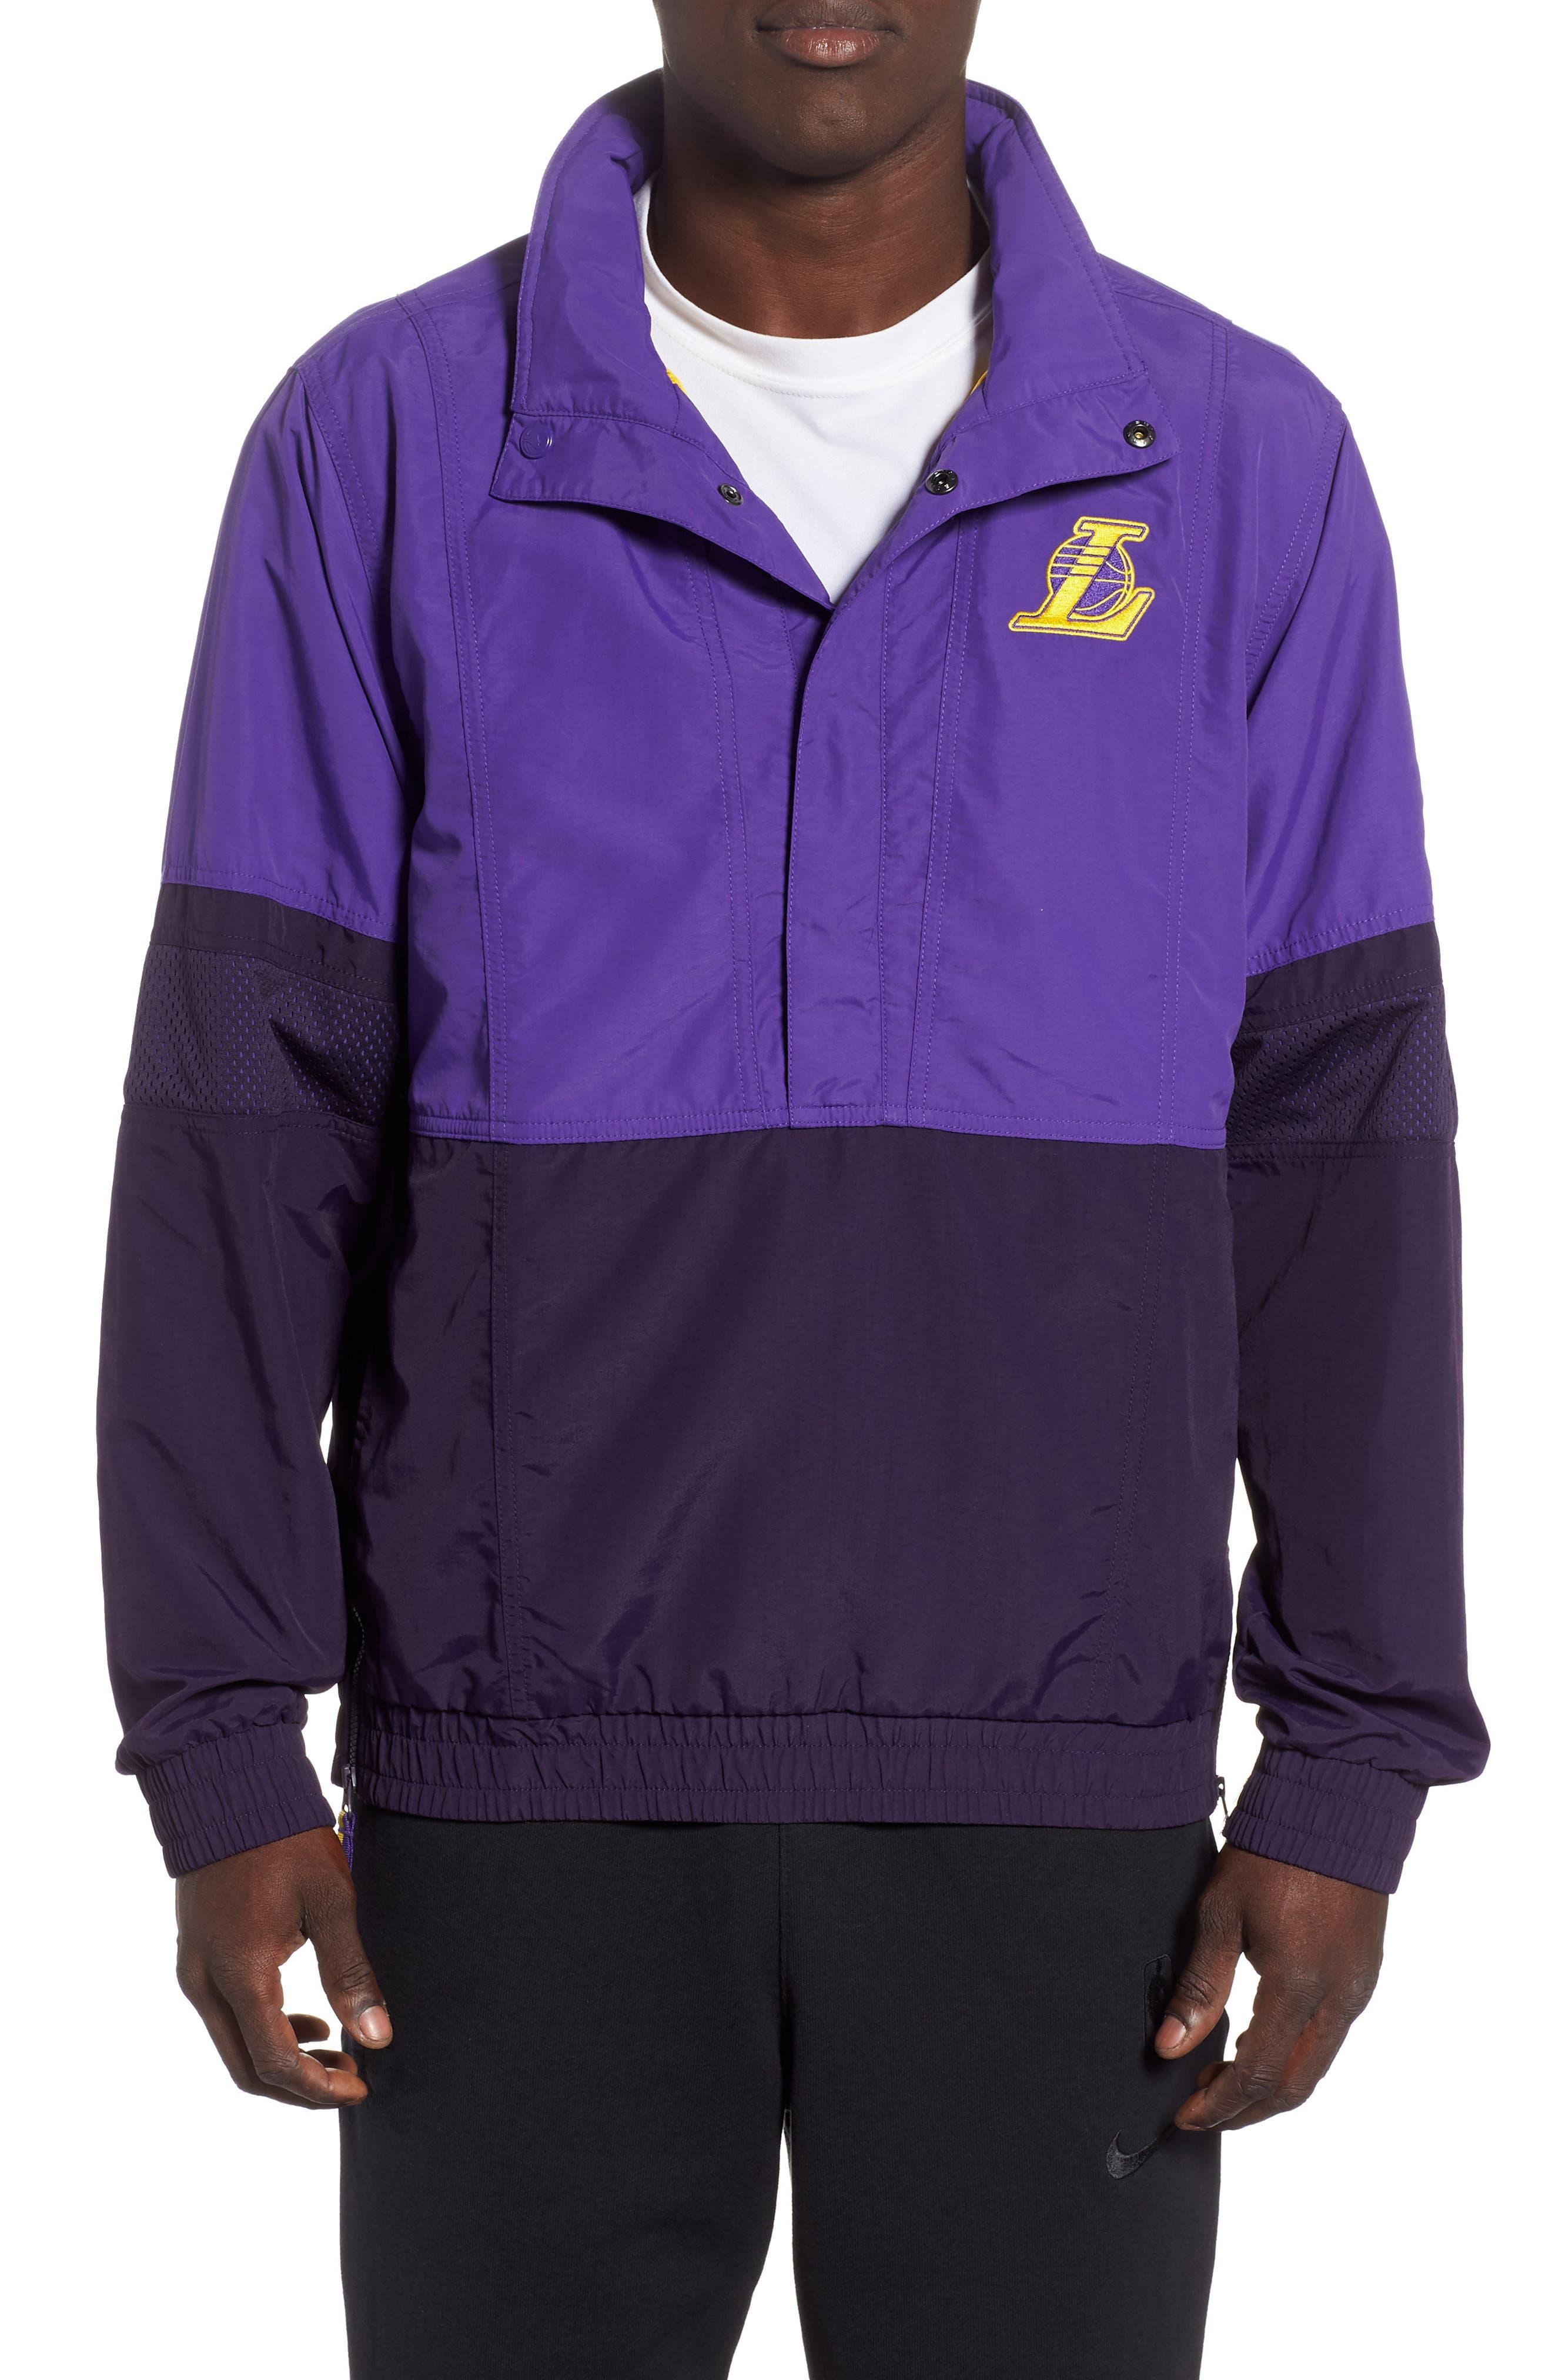 Los Angeles Lakers Courtside Warm-Up Jacket,                         Main,                         color, FIELD PURPLE/PURPLE/ AMARILLO